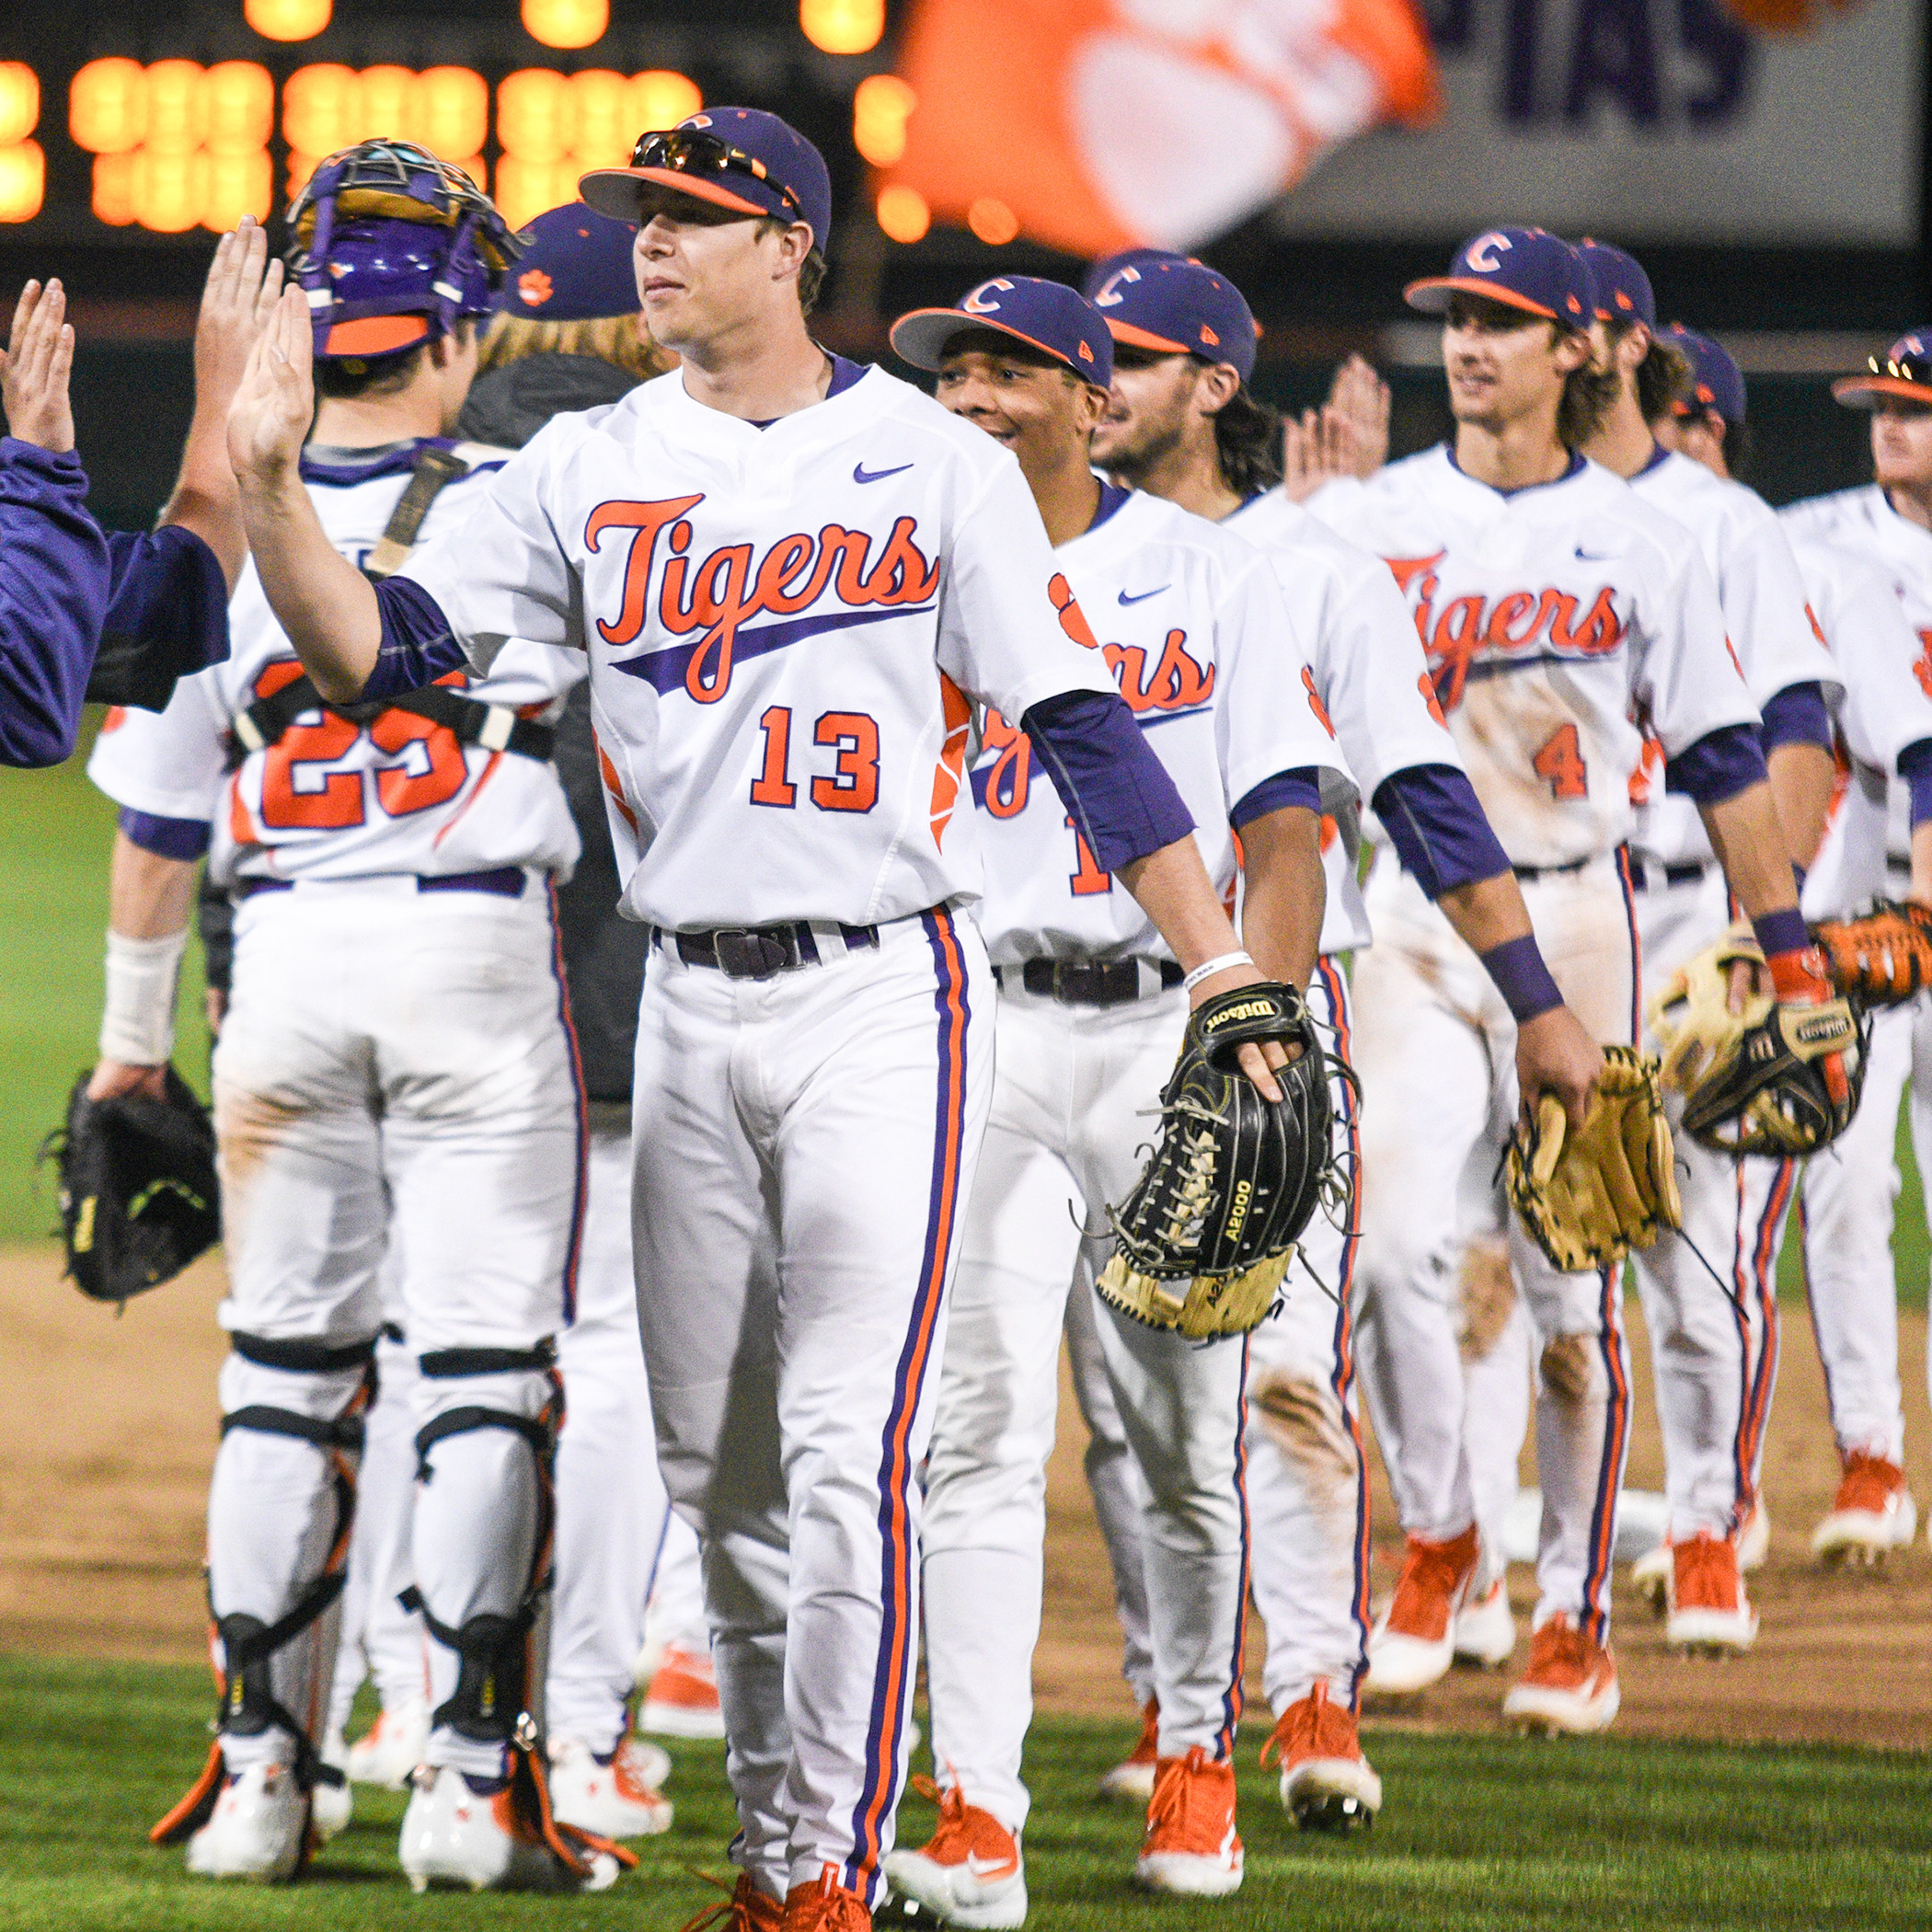 Tigers Play No. 4 Miami (Fla.)